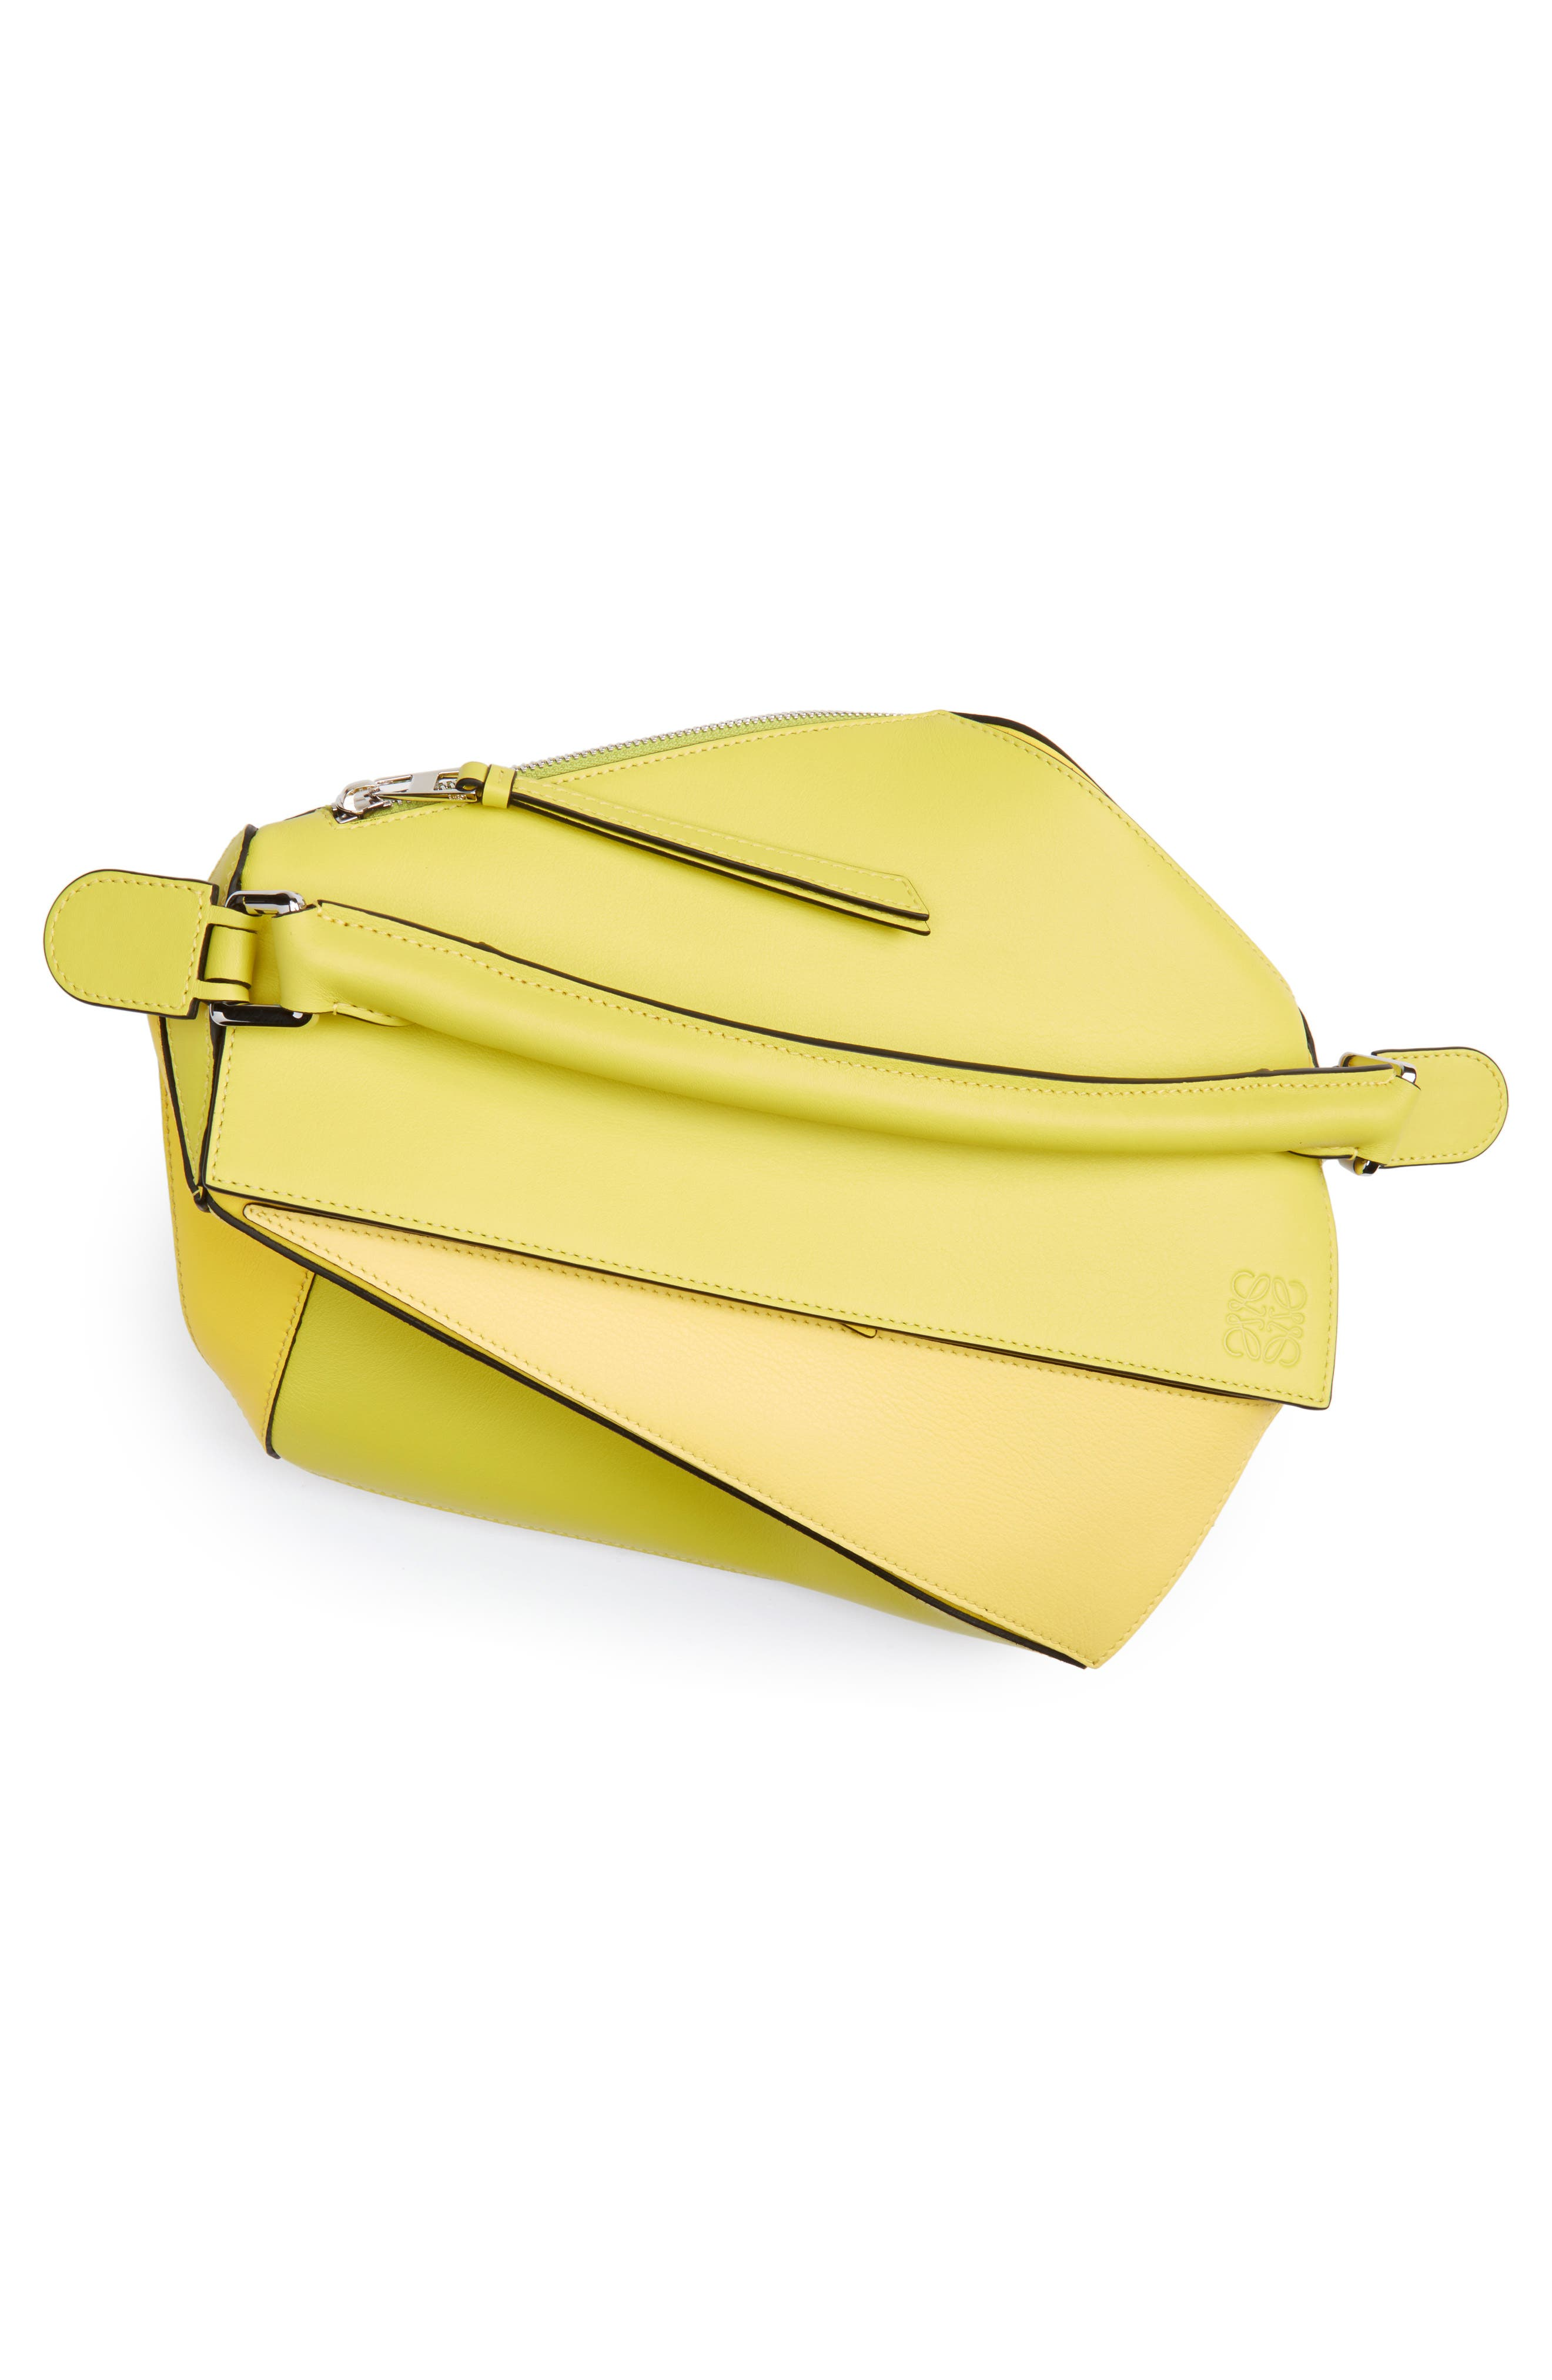 Medium Puzzle Calfskin Leather Shoulder Bag,                             Alternate thumbnail 4, color,                             Yellow Multitone